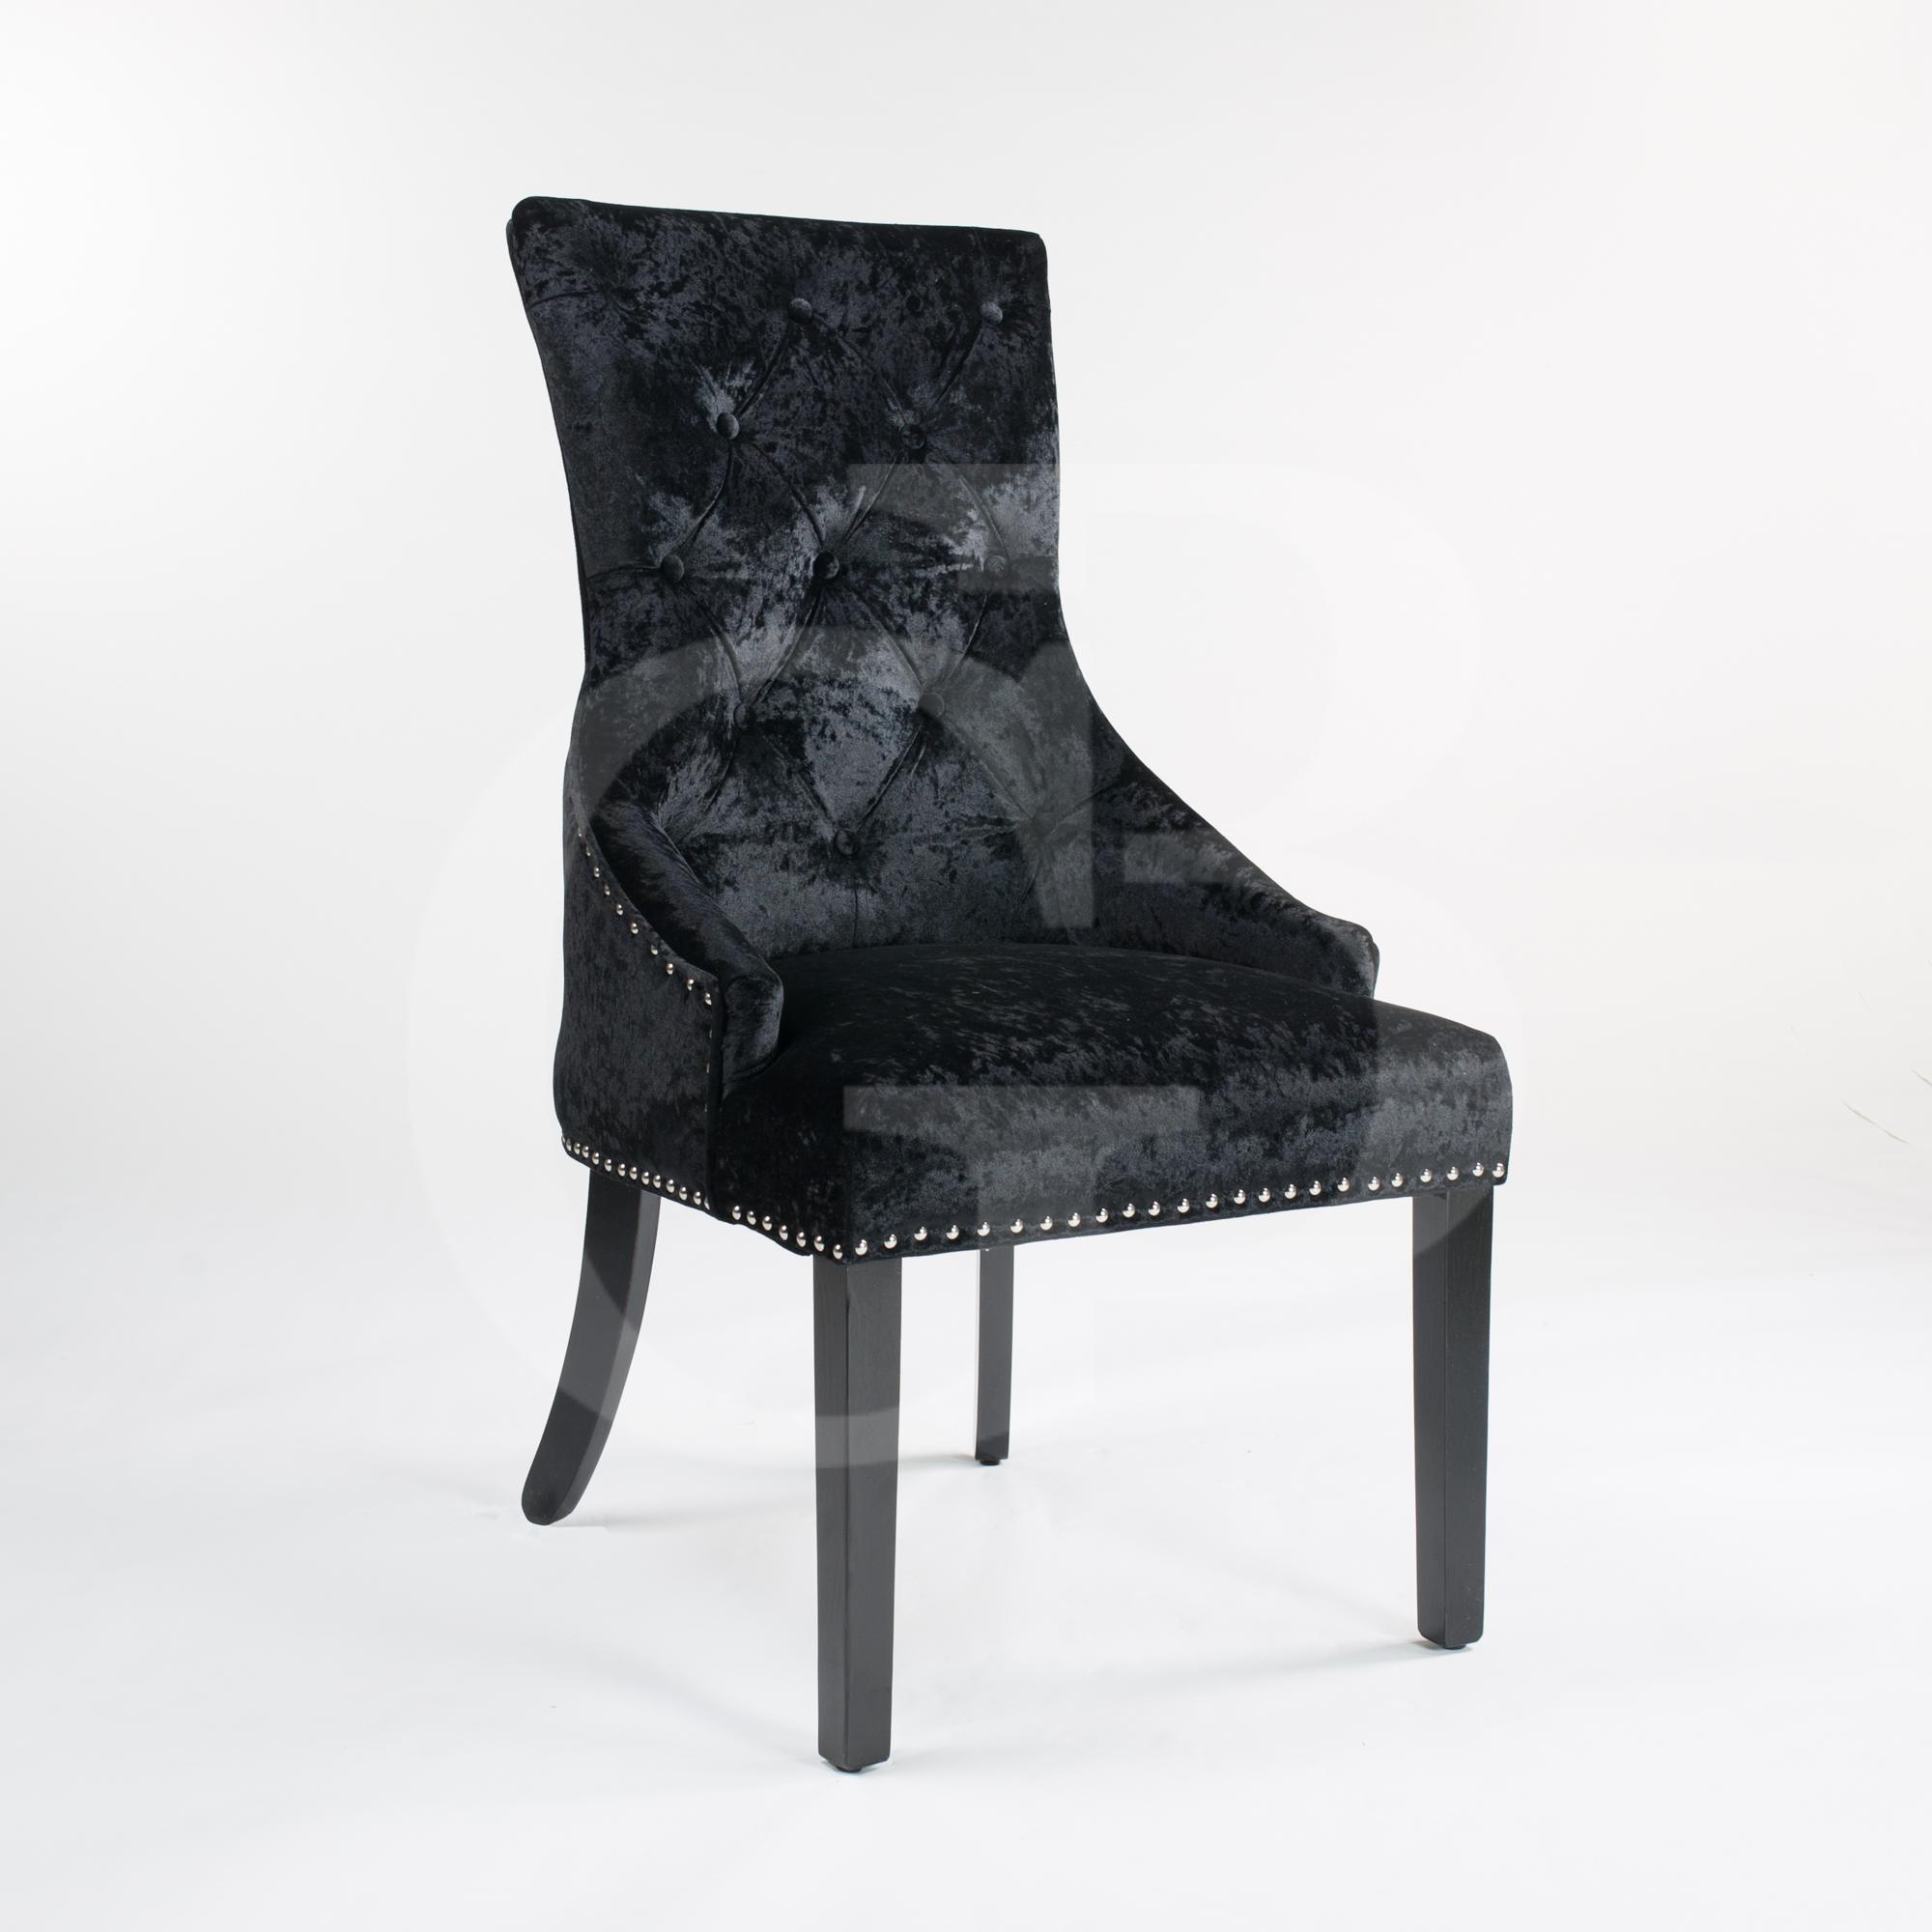 Black Upholstered Crushed Velvet Dining Chair With Chrome